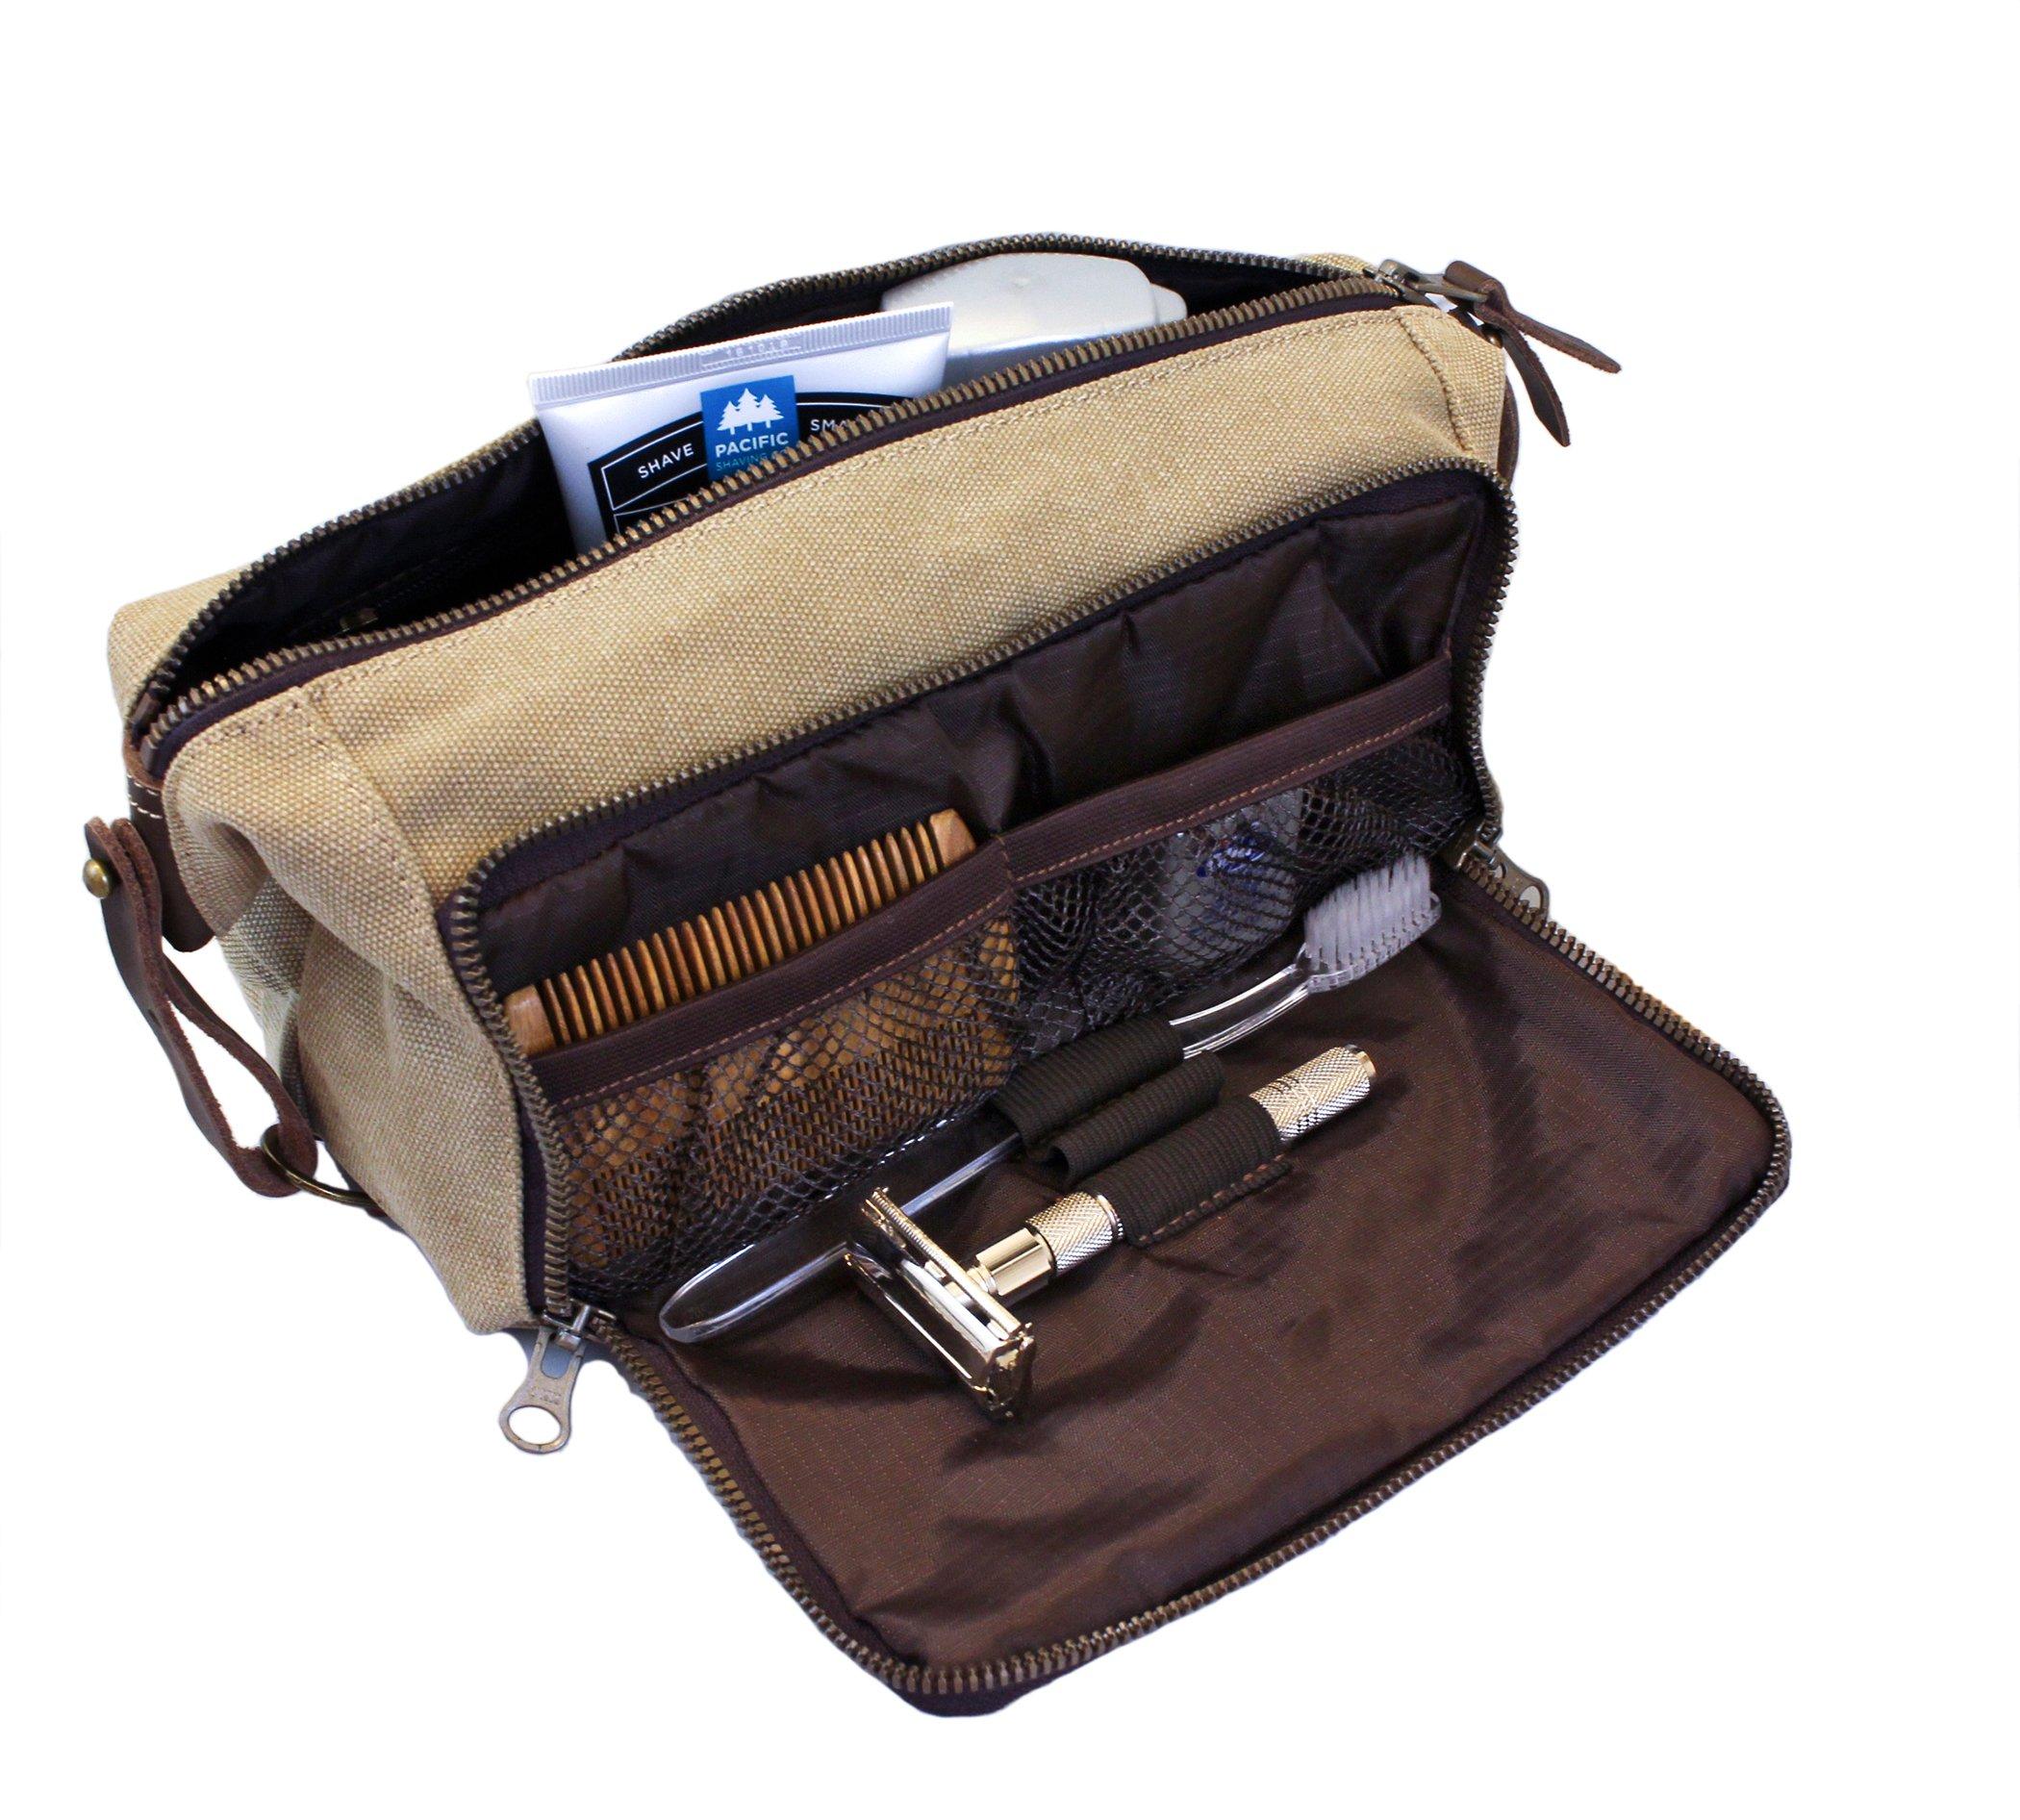 ea5372a8df Amazon.com   DOPP Kit Mens Toiletry Travel Bag YKK Zipper Canvas   Leather  (Large